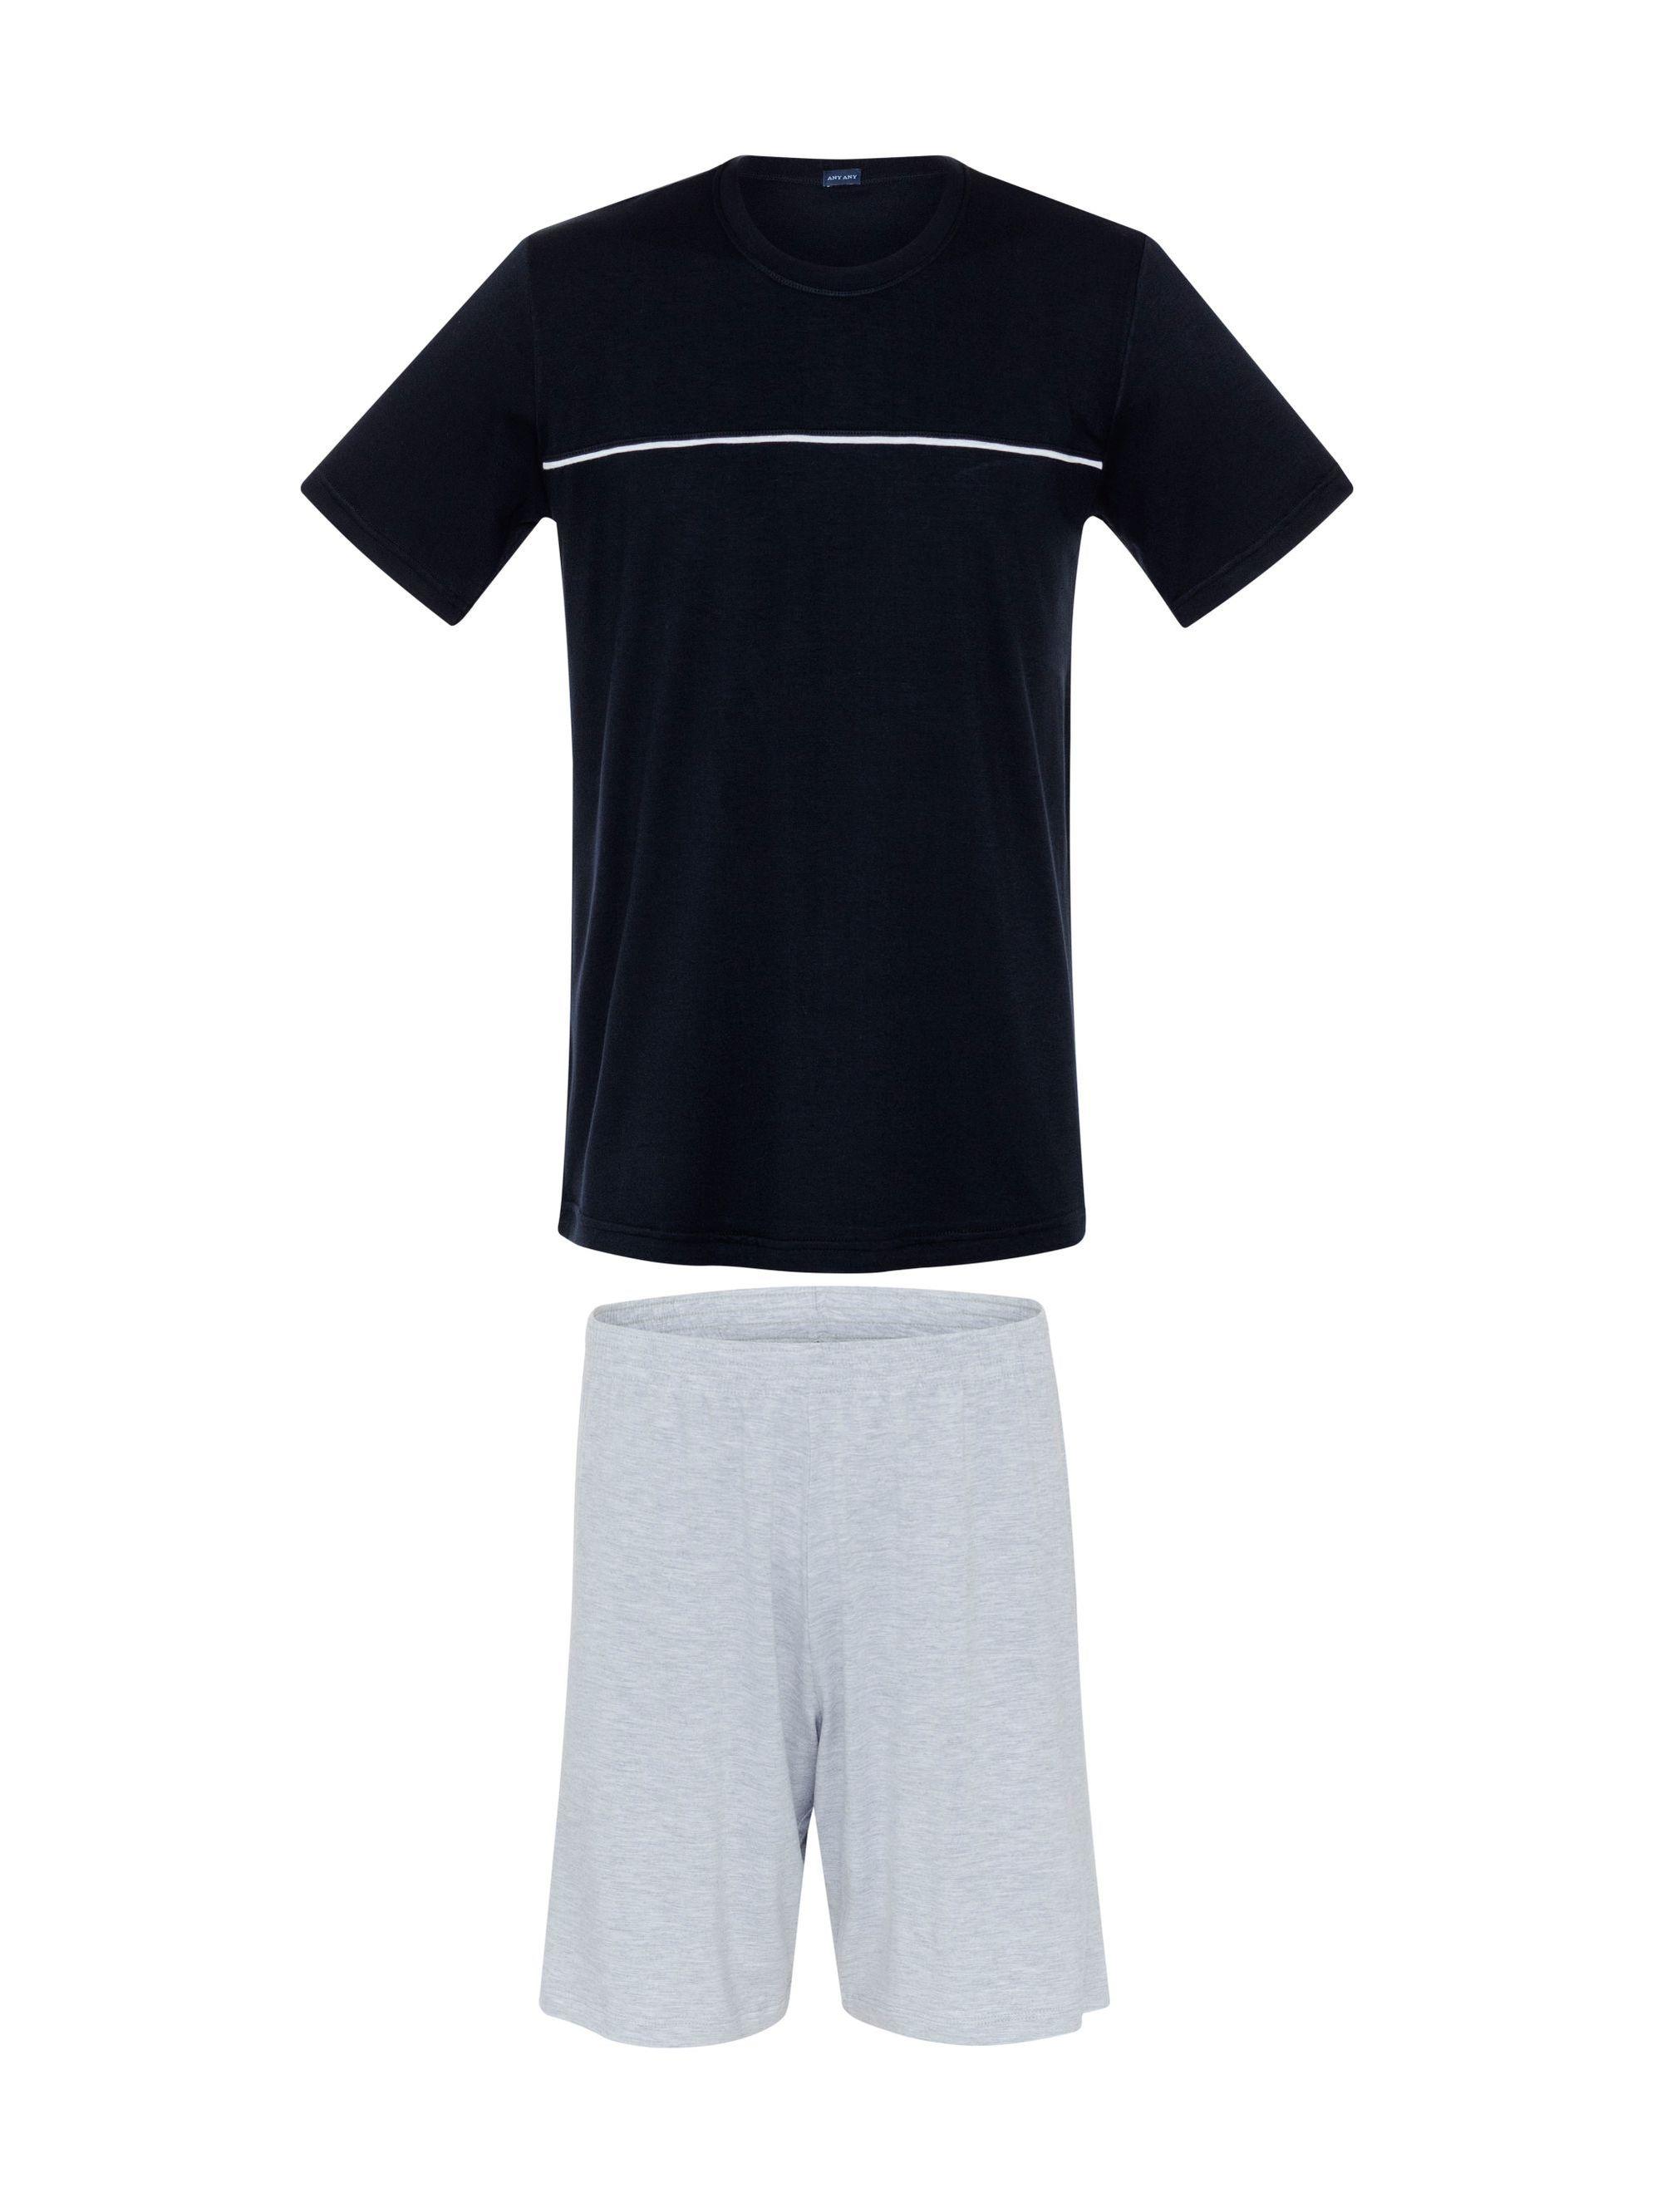 Pijama-Curto-Manga-Curta-Friso---04020751_